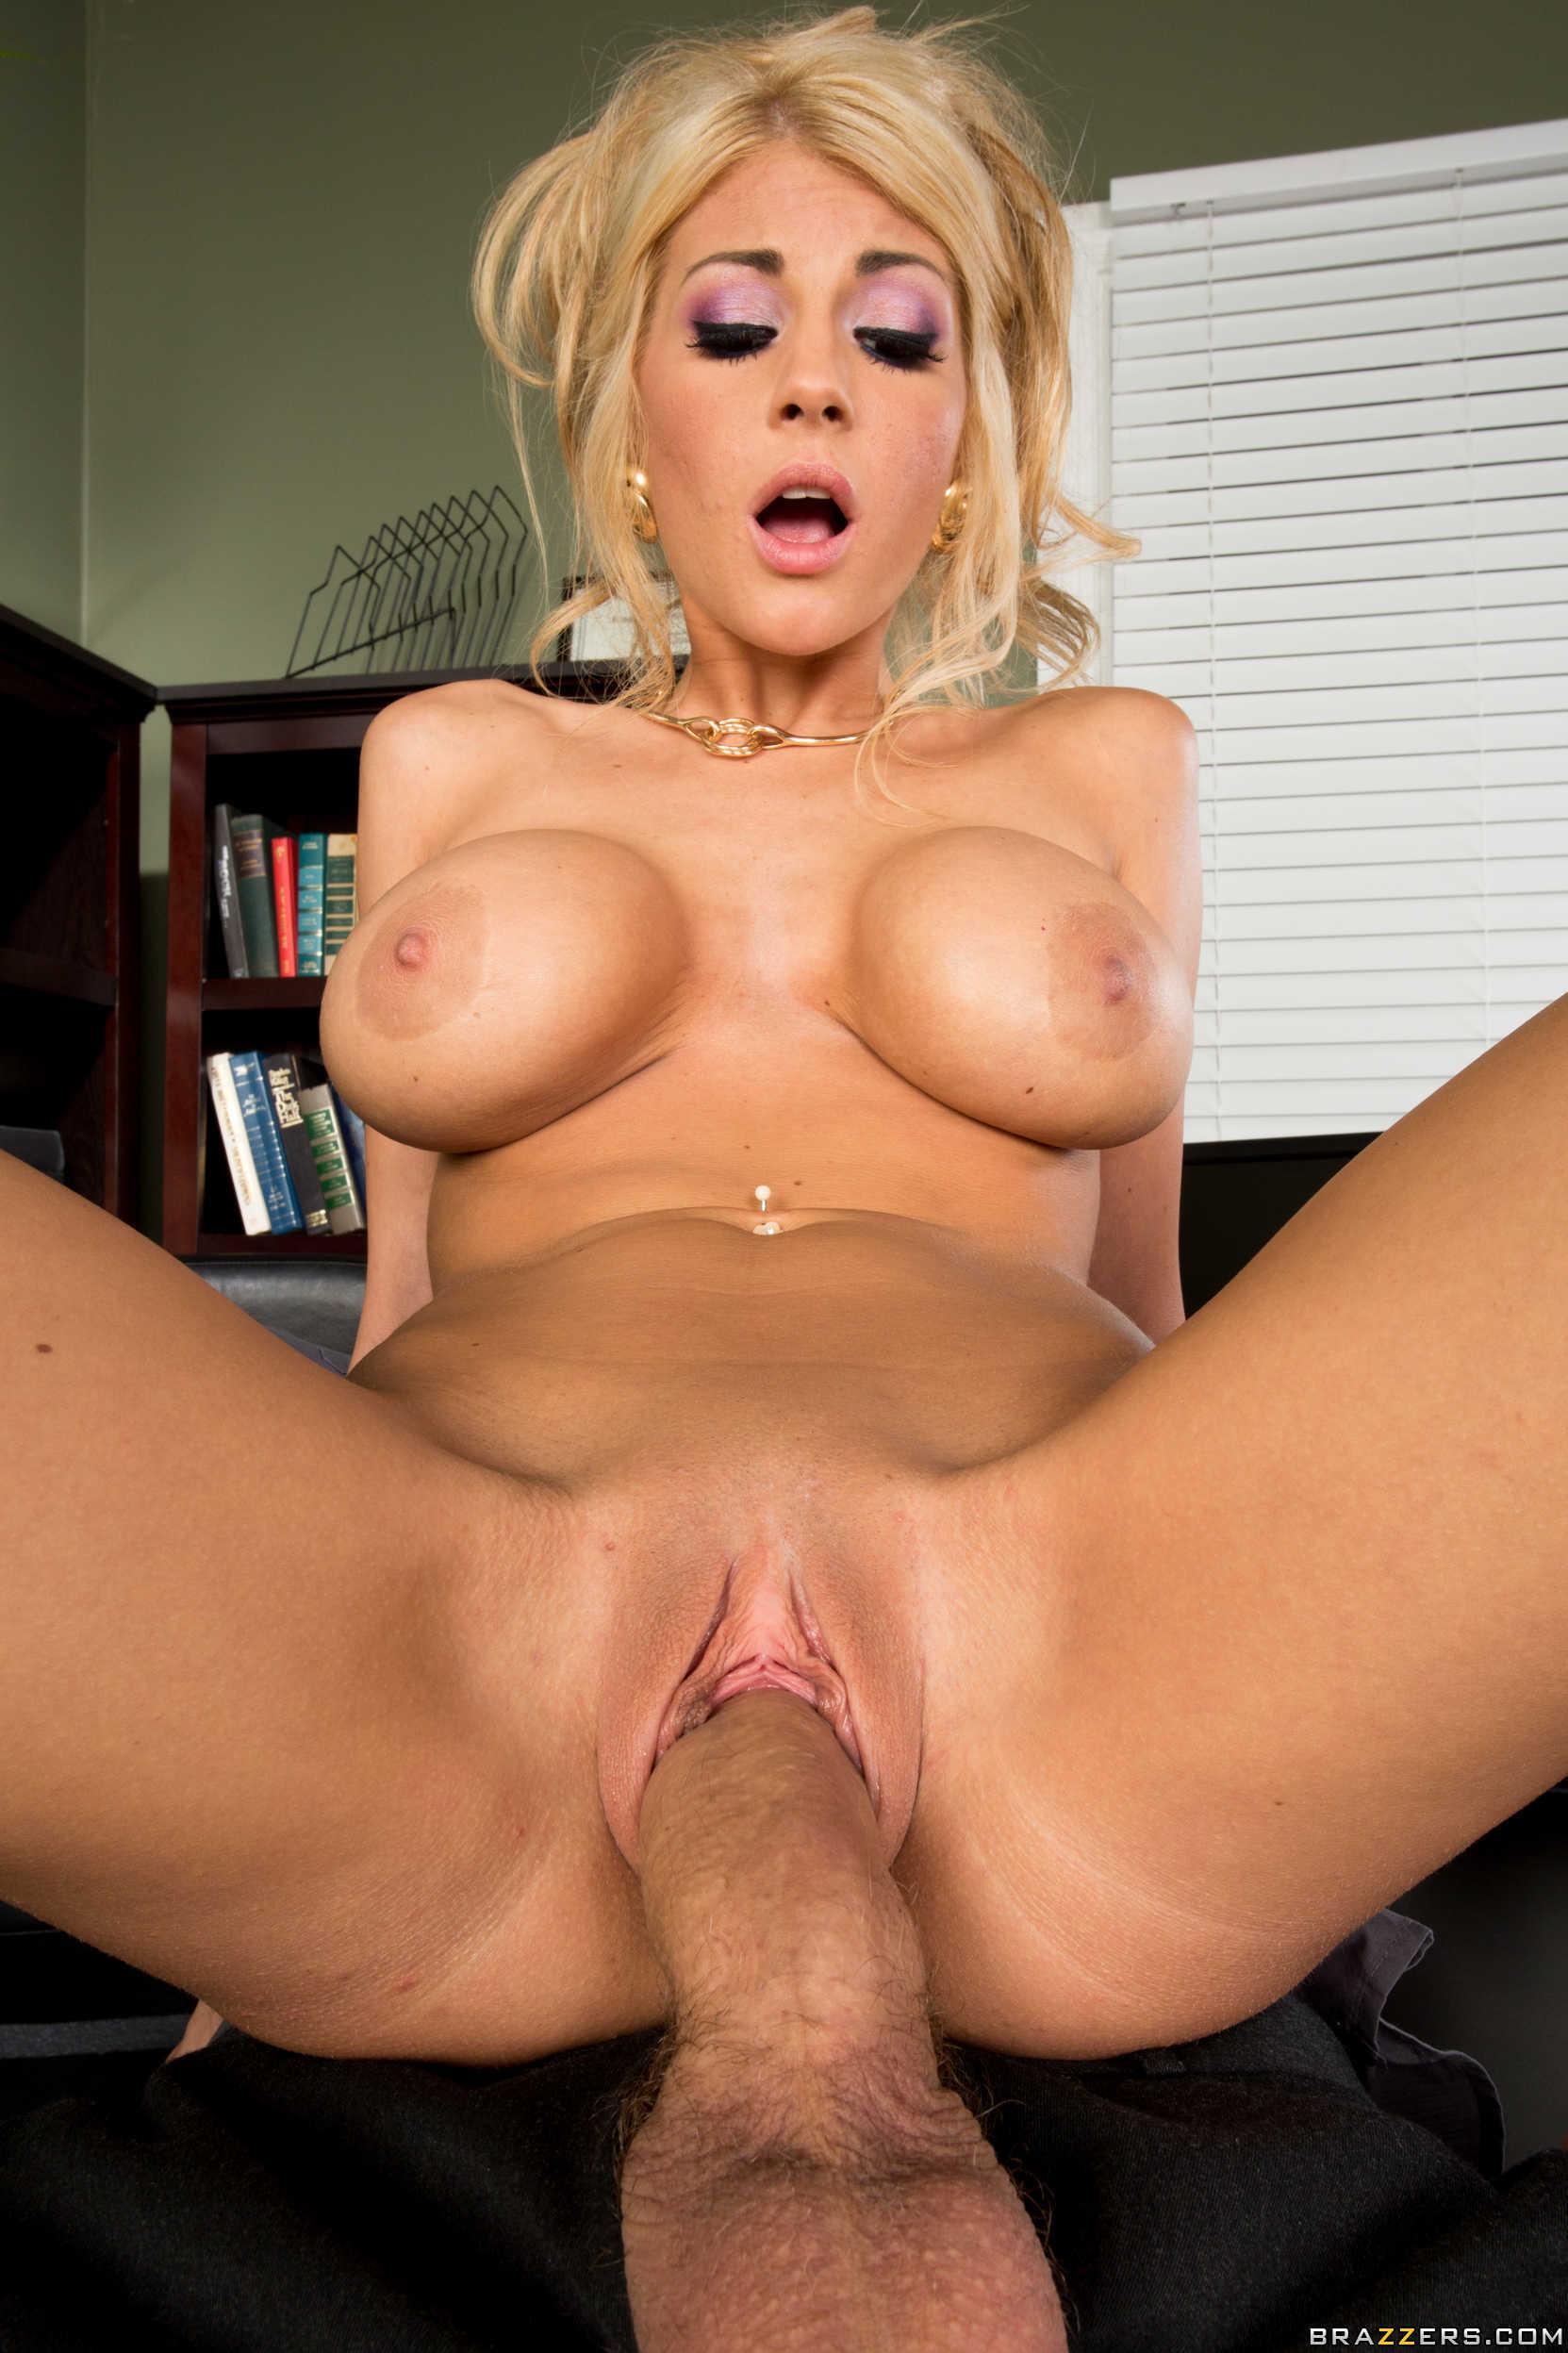 Hot Blondes Babes Porn